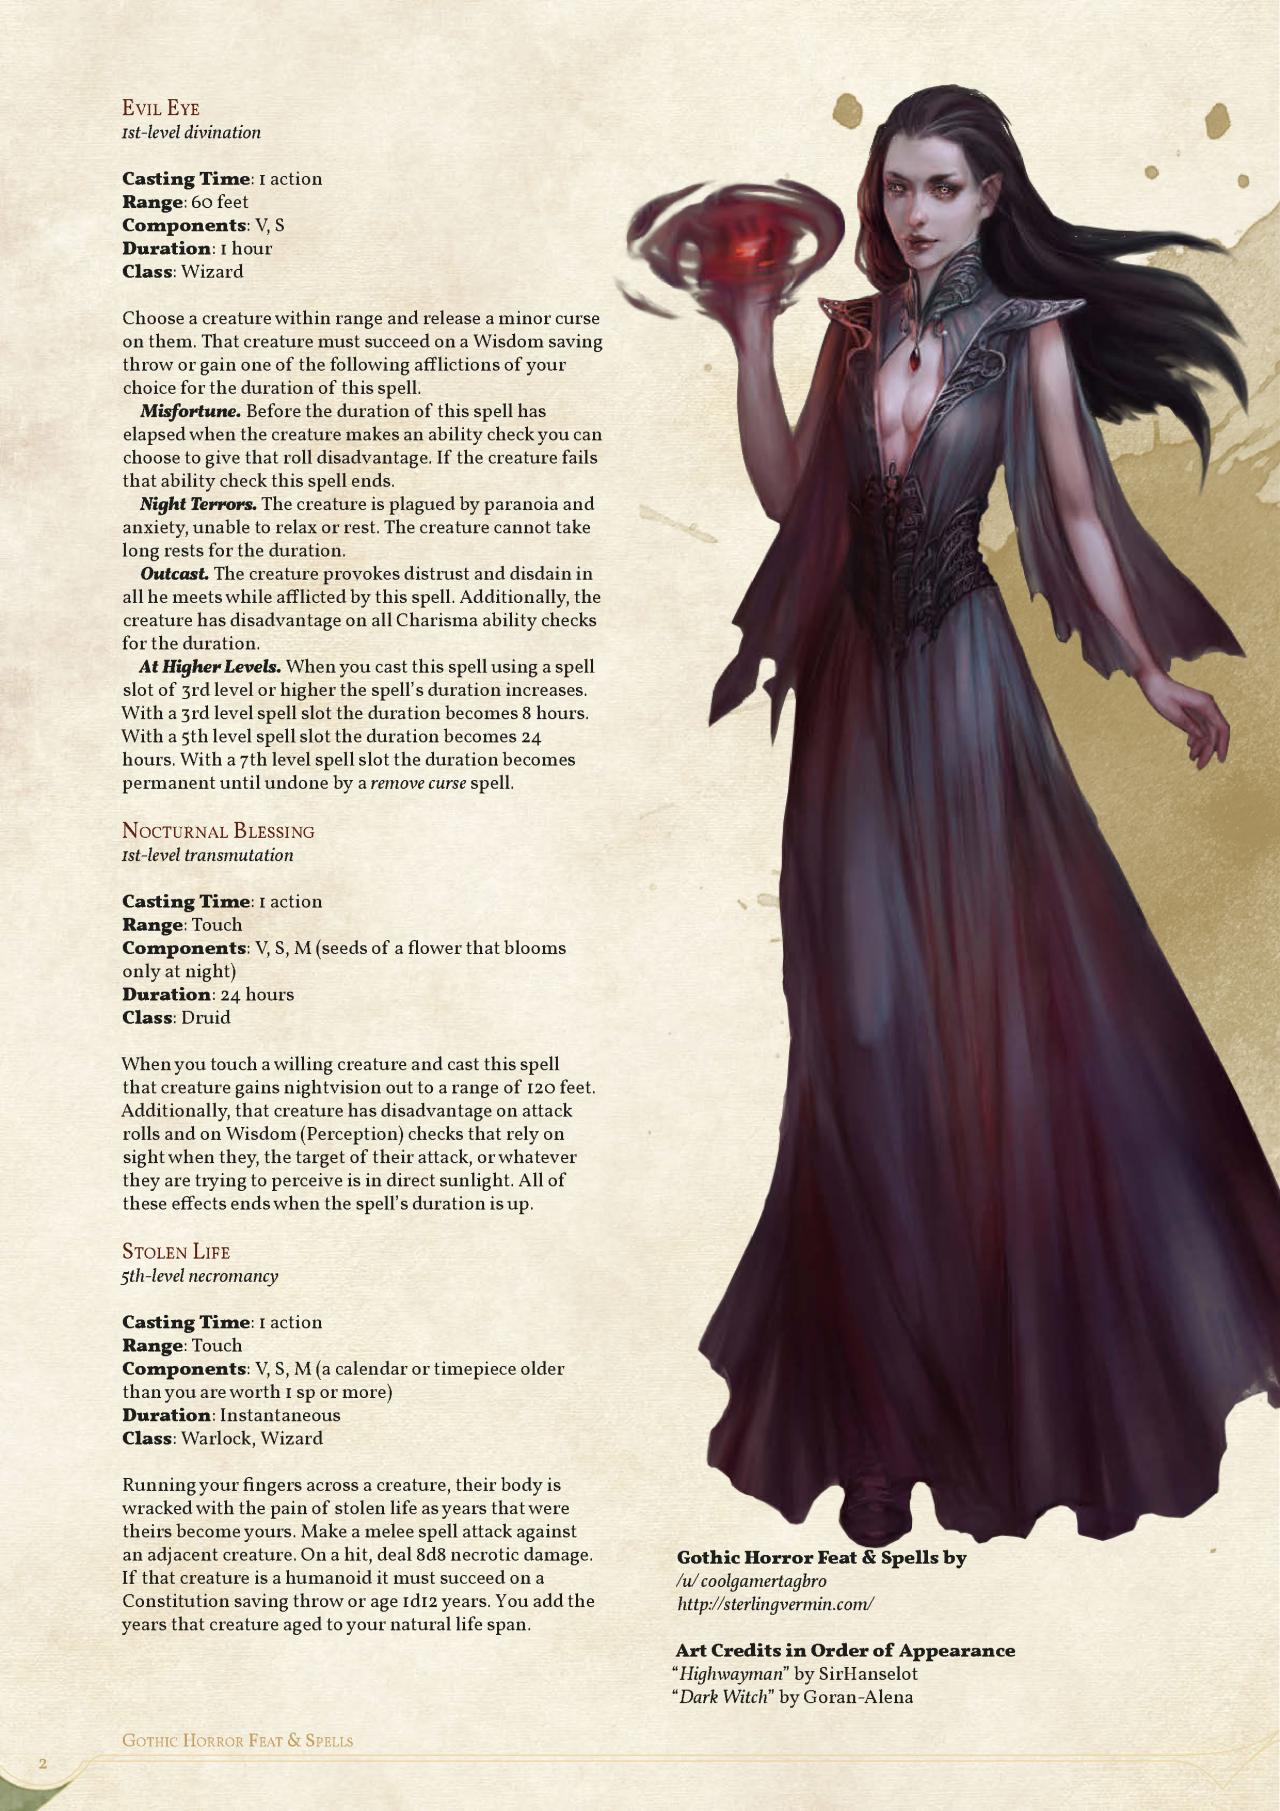 DnD 5e Homebrew — Gothic Spells by coolgamertagbro / Sterling Vermin